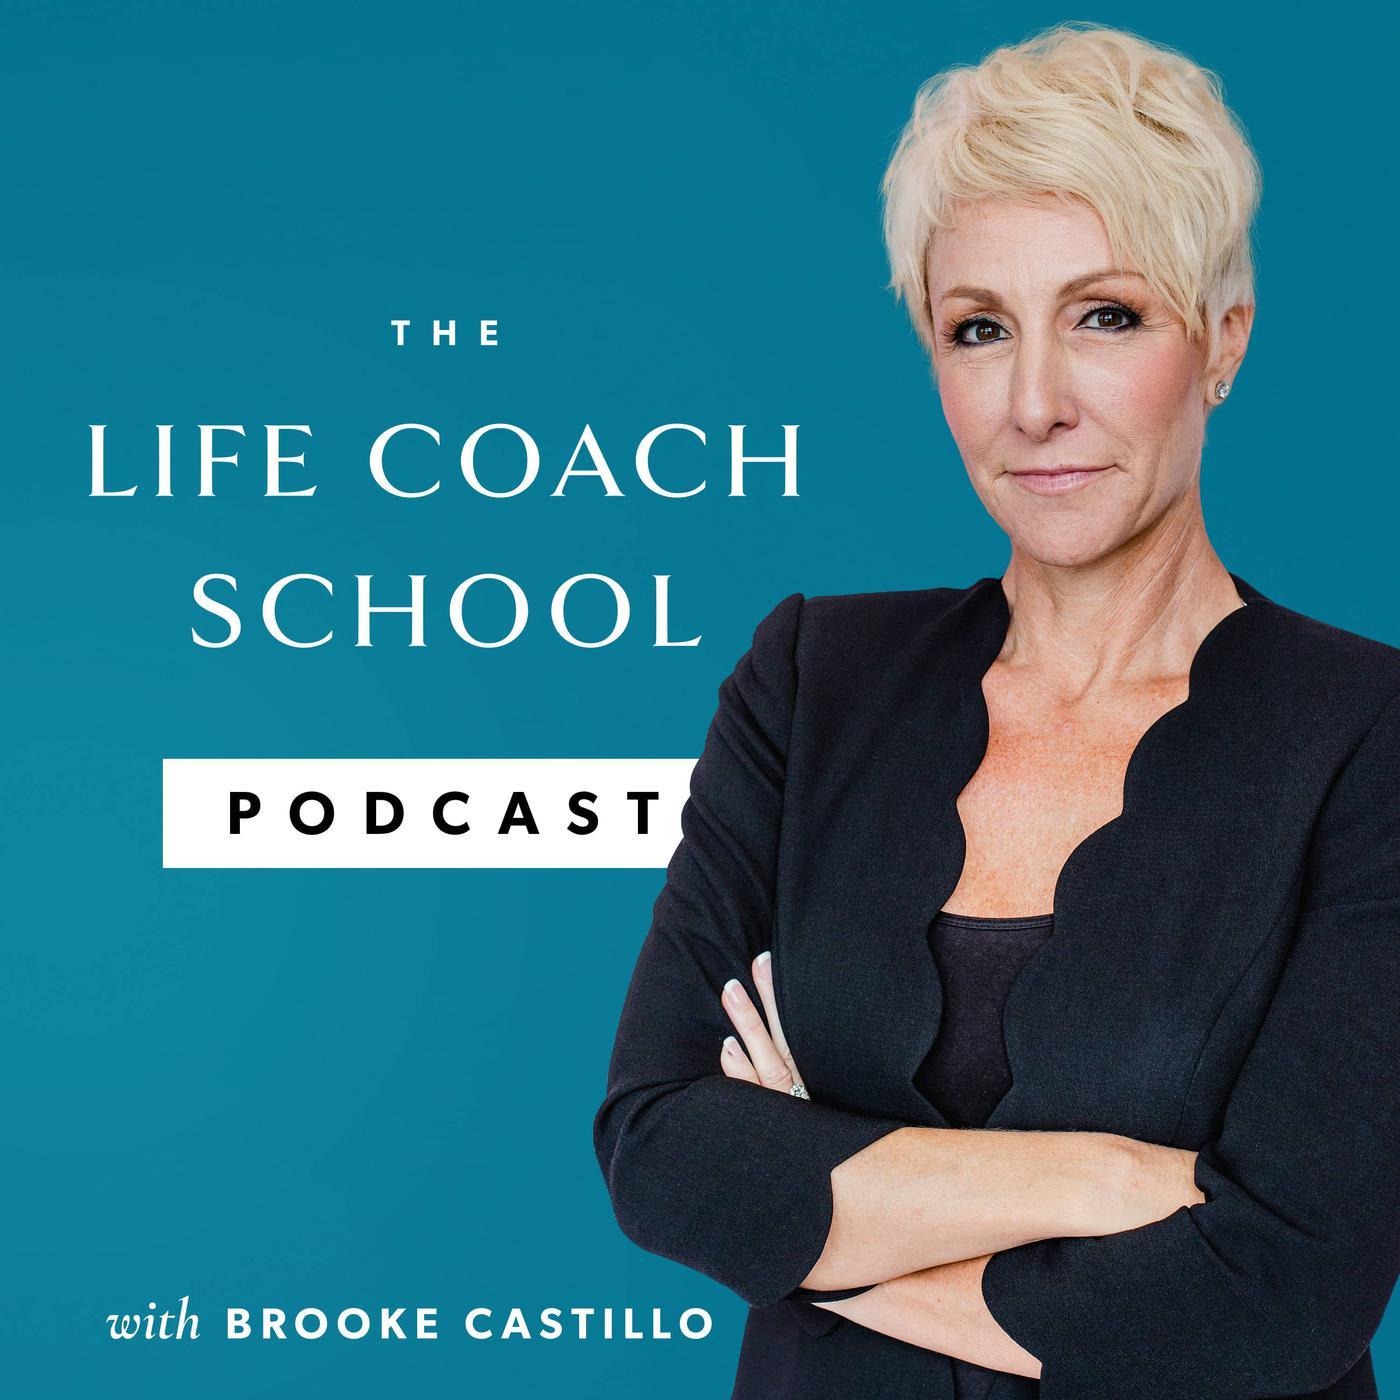 The Life Coach School Podcast - Brooke Castillo | Listen Notes